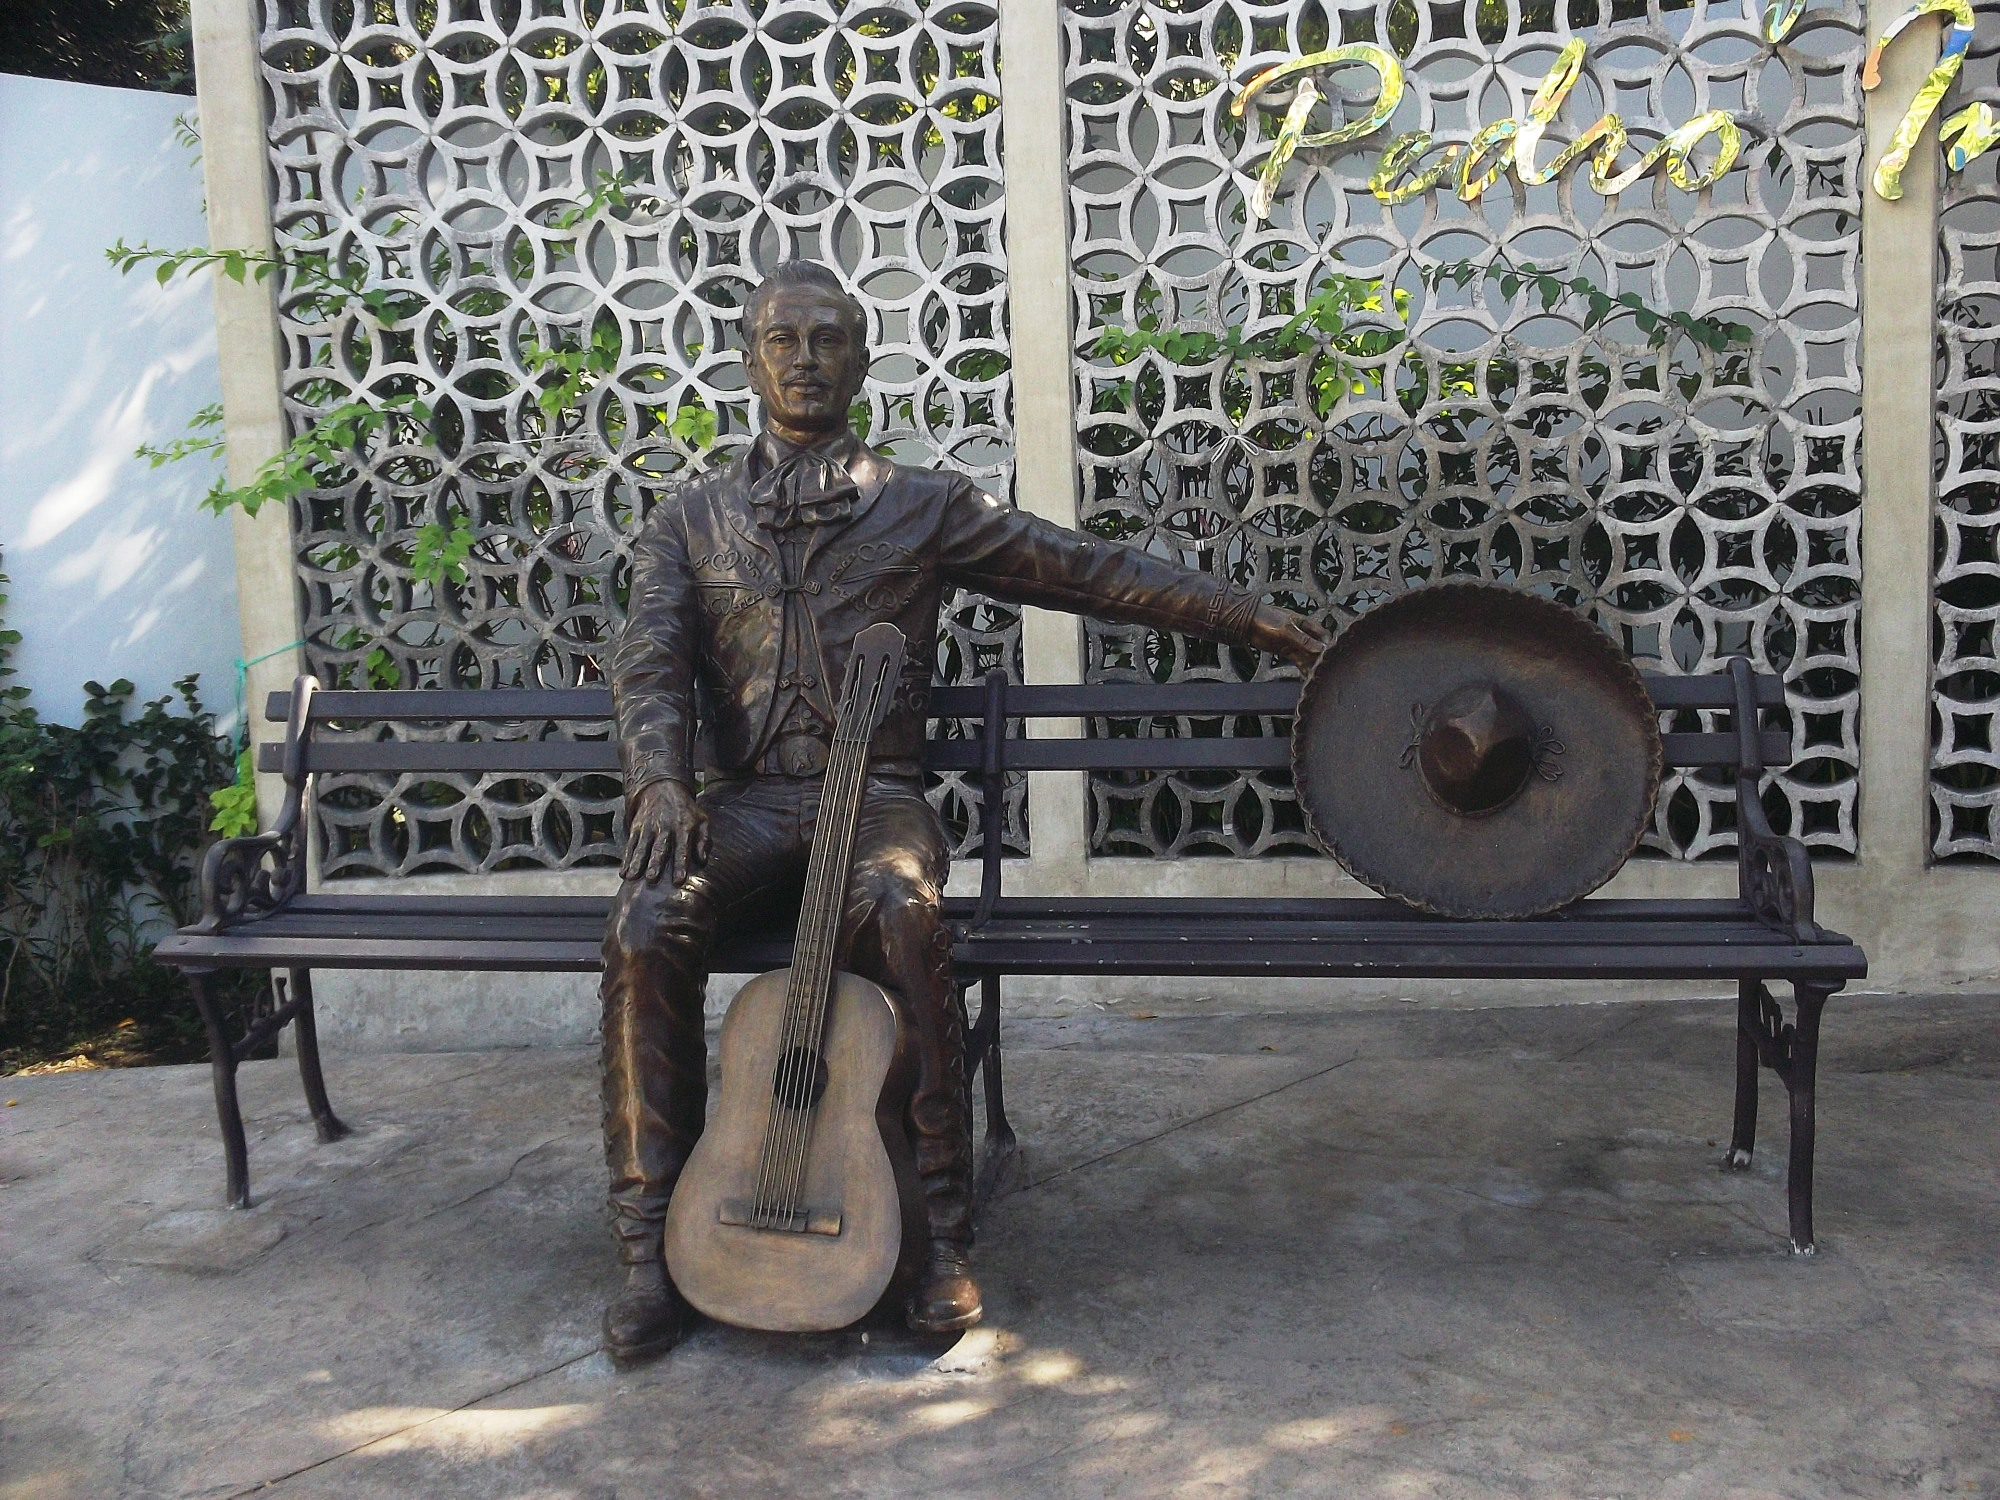 Pedro Infante Peliculas